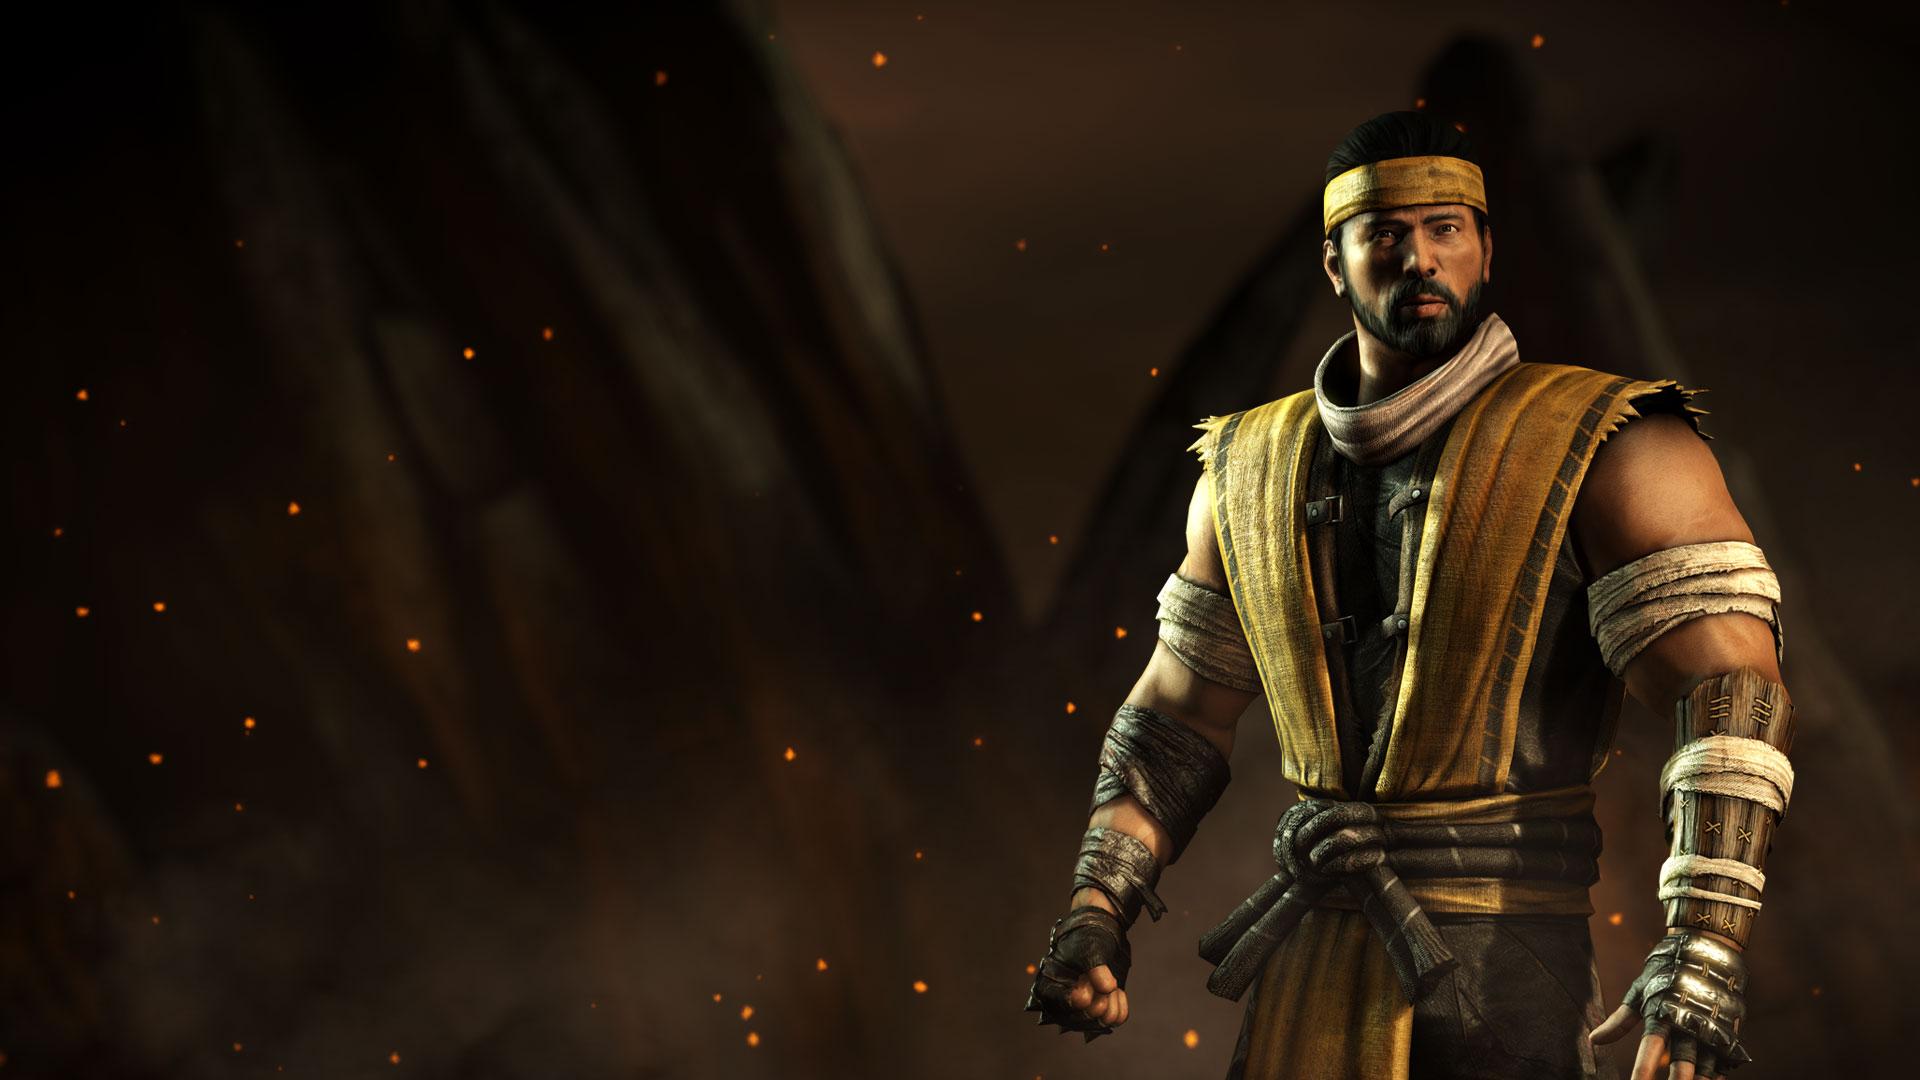 3d Video Games Wallpapers Mkwarehouse Mortal Kombat X Wallpapers